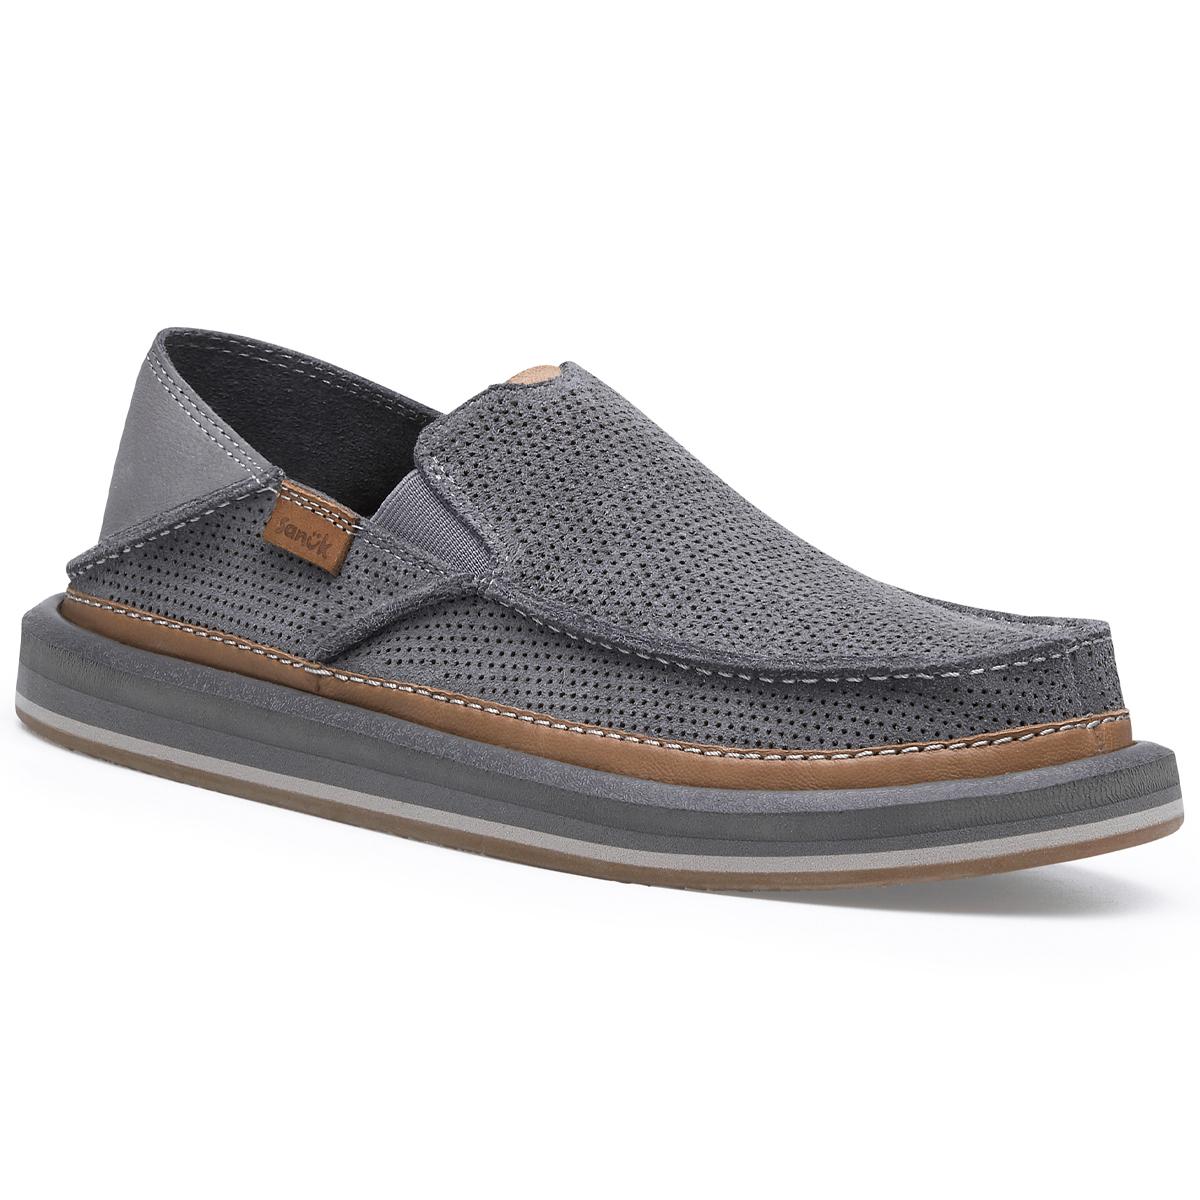 Sanuk-Shoe-Vagabond-St-X-Airstream-Leather-Grey-2